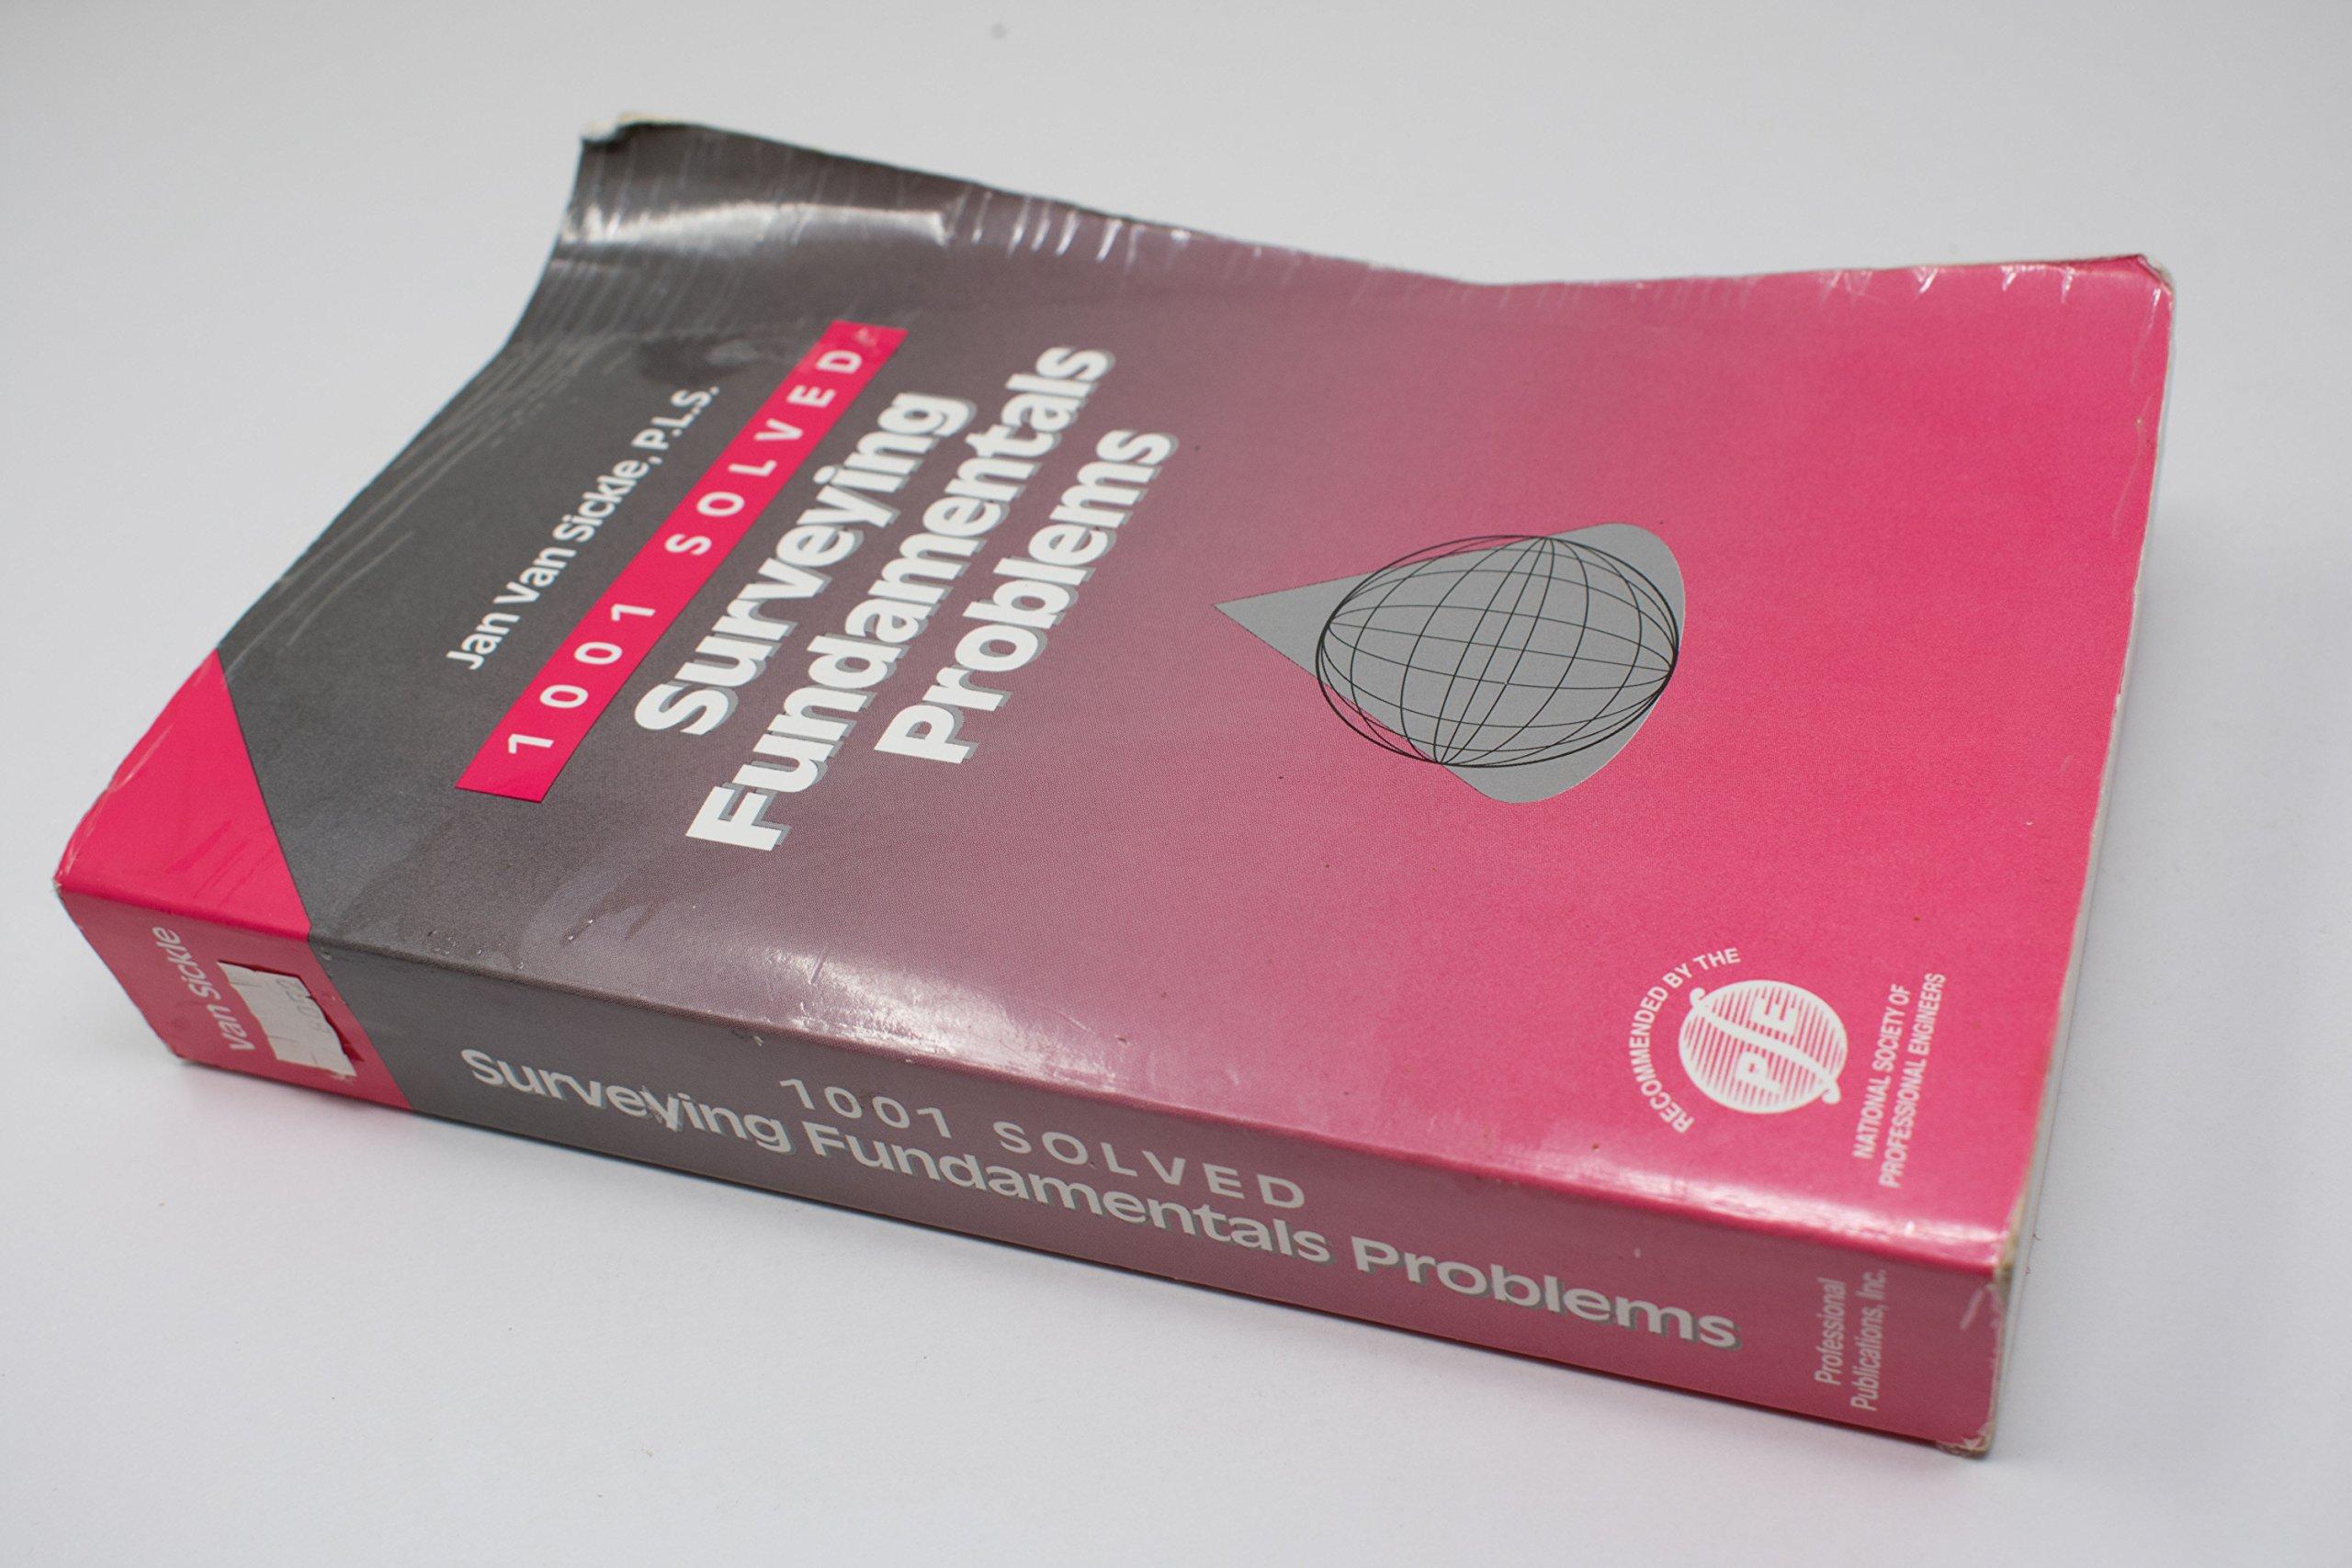 1001 Solved Surveying Fundamentals Problems: Jan Van Sickle: 9780912045542:  Books - Amazon.ca